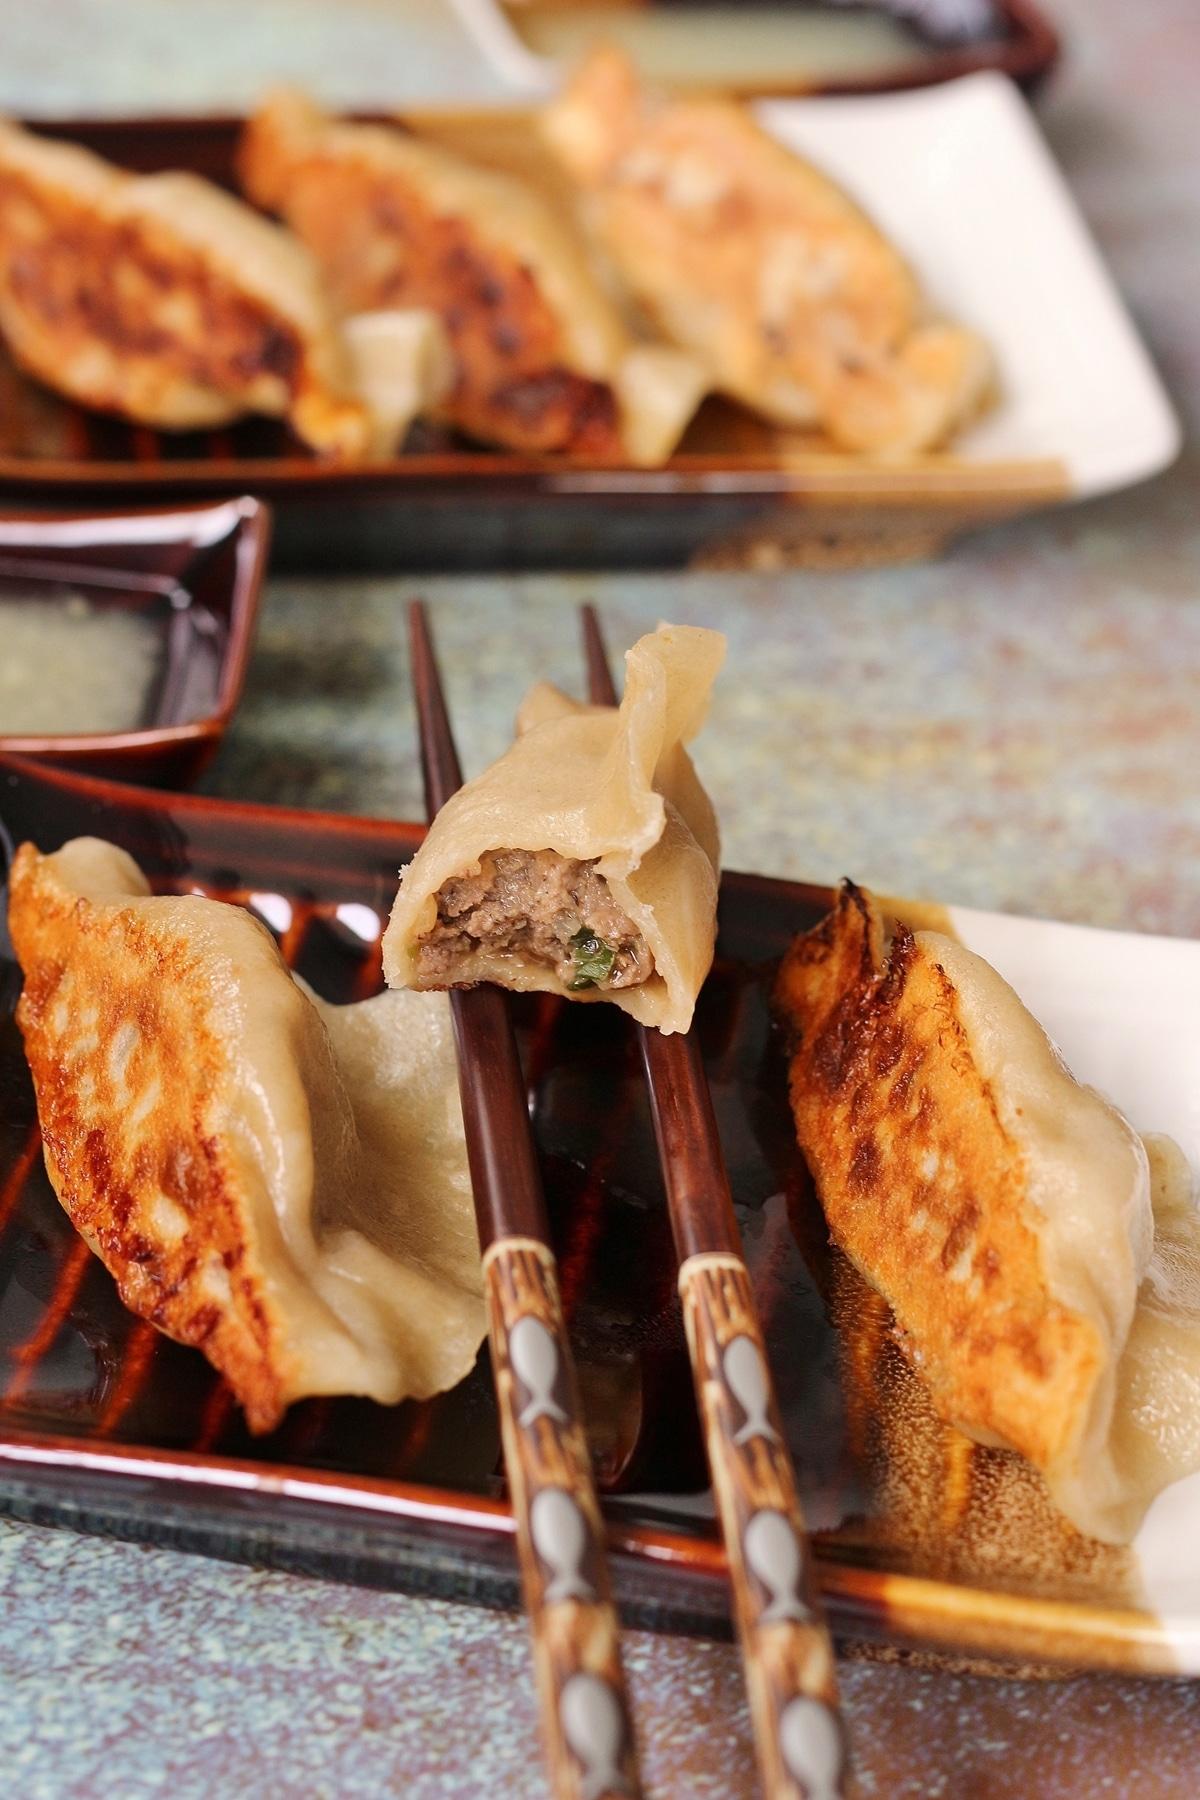 two small plates of pan-fried dumplings with a half-eaten dumpling resting on chopsticks